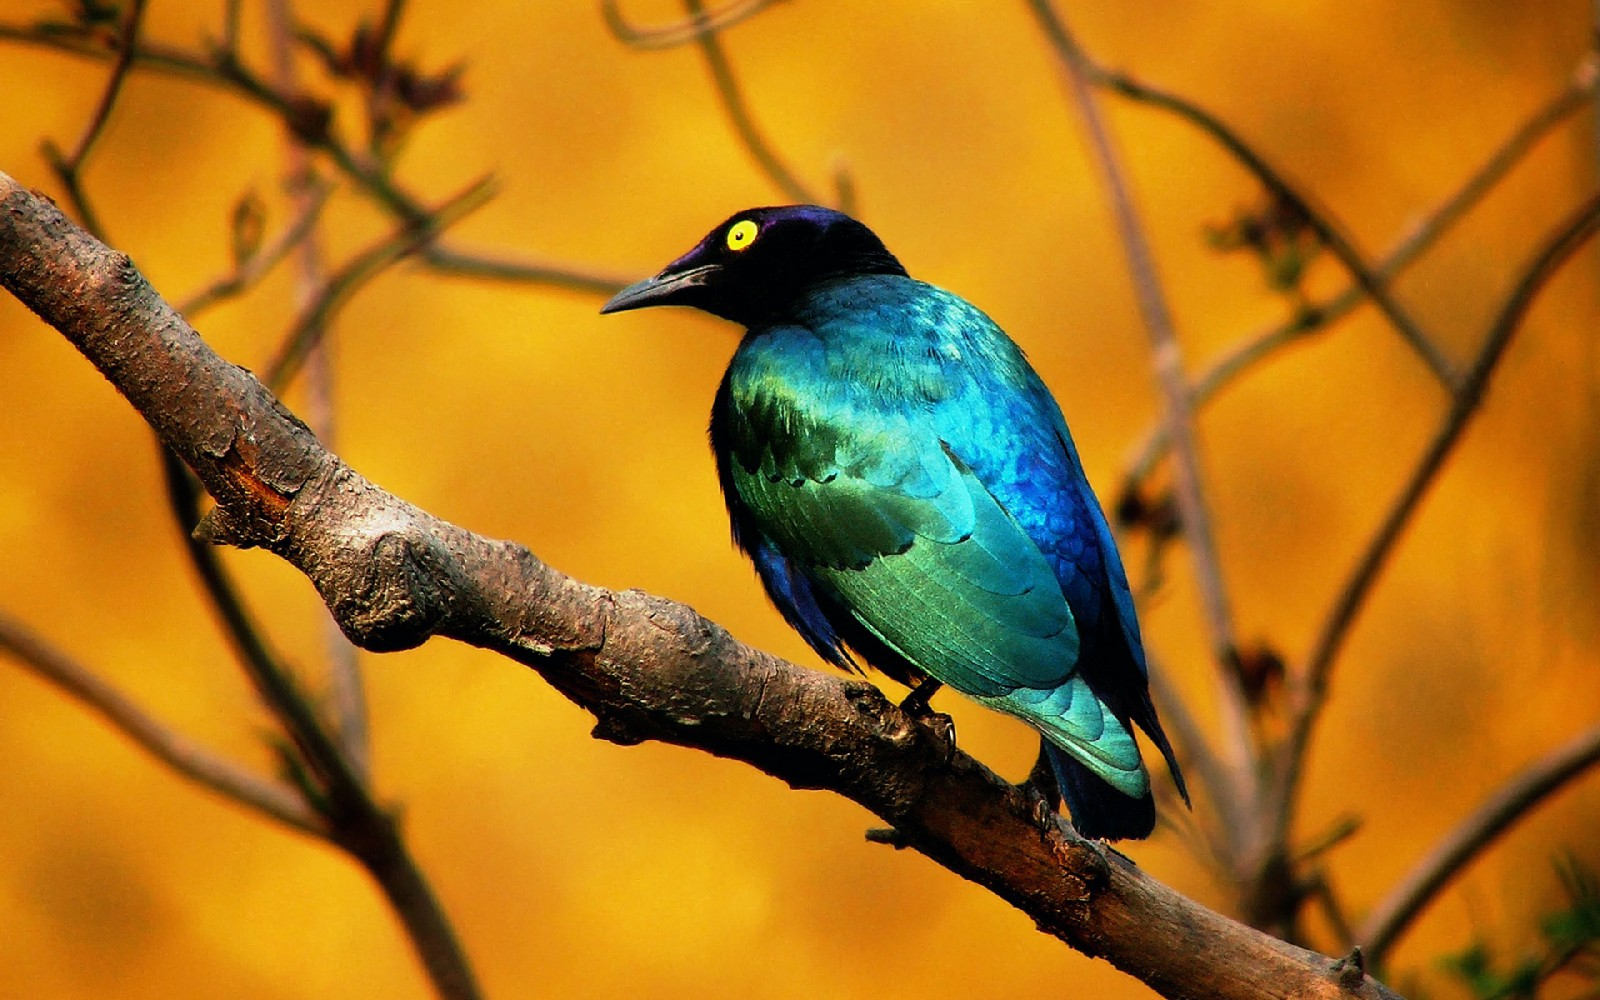 Bird On Tree High Quality Hd Wallpaper Hd Wallpapers